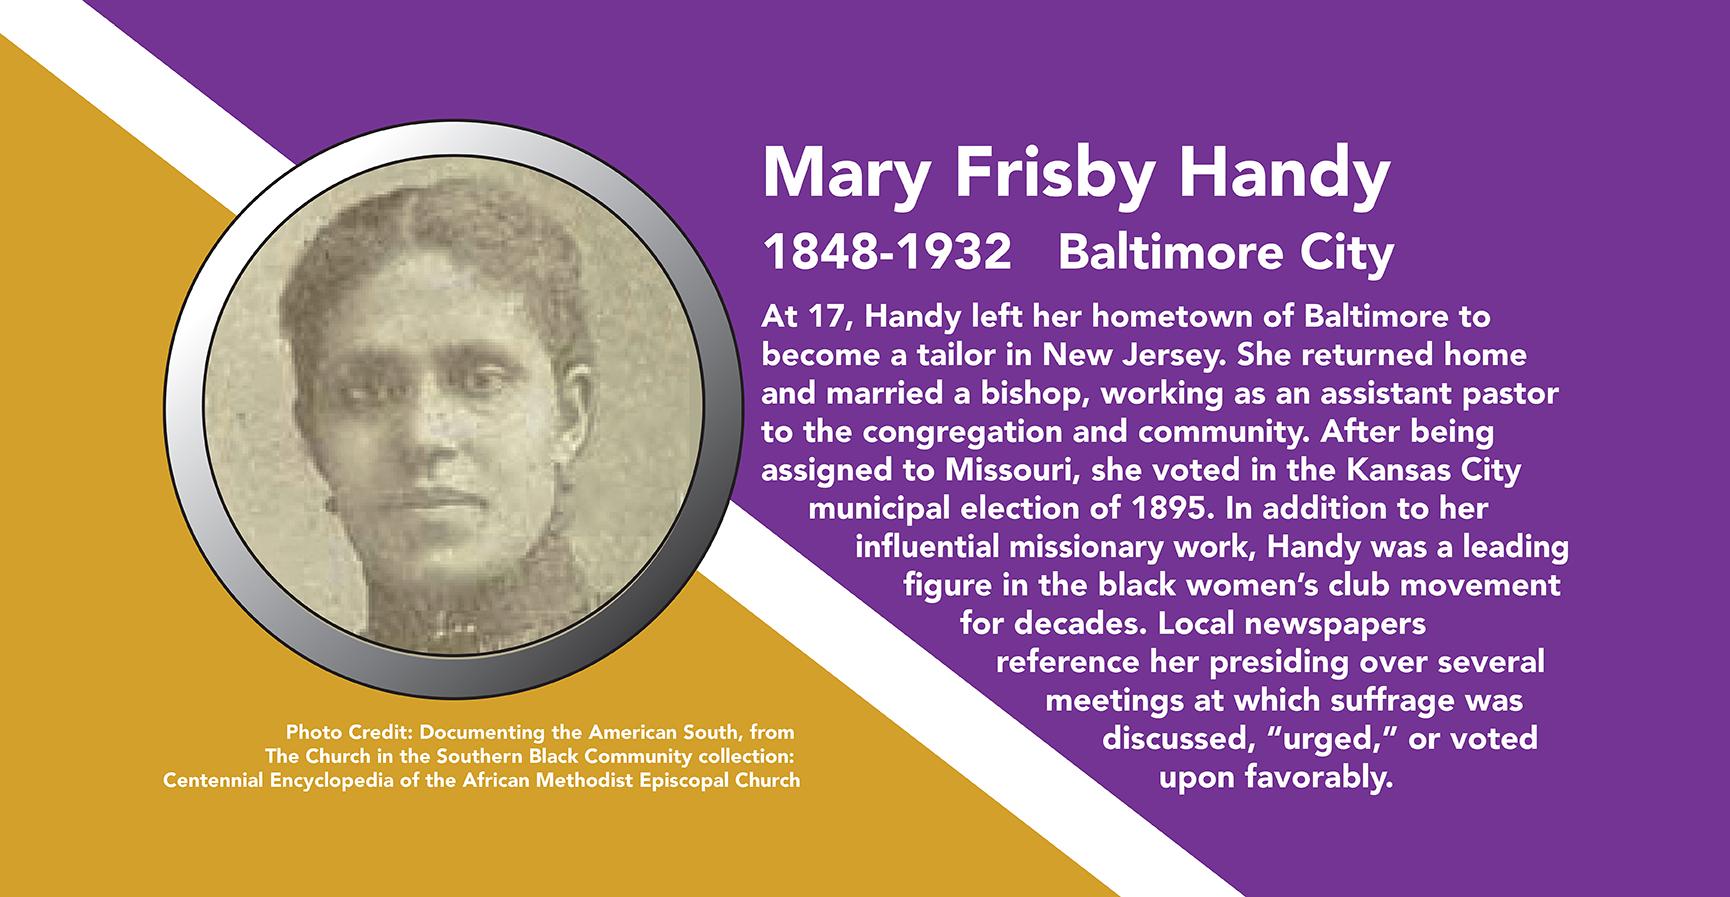 MaryFrisbyHandy